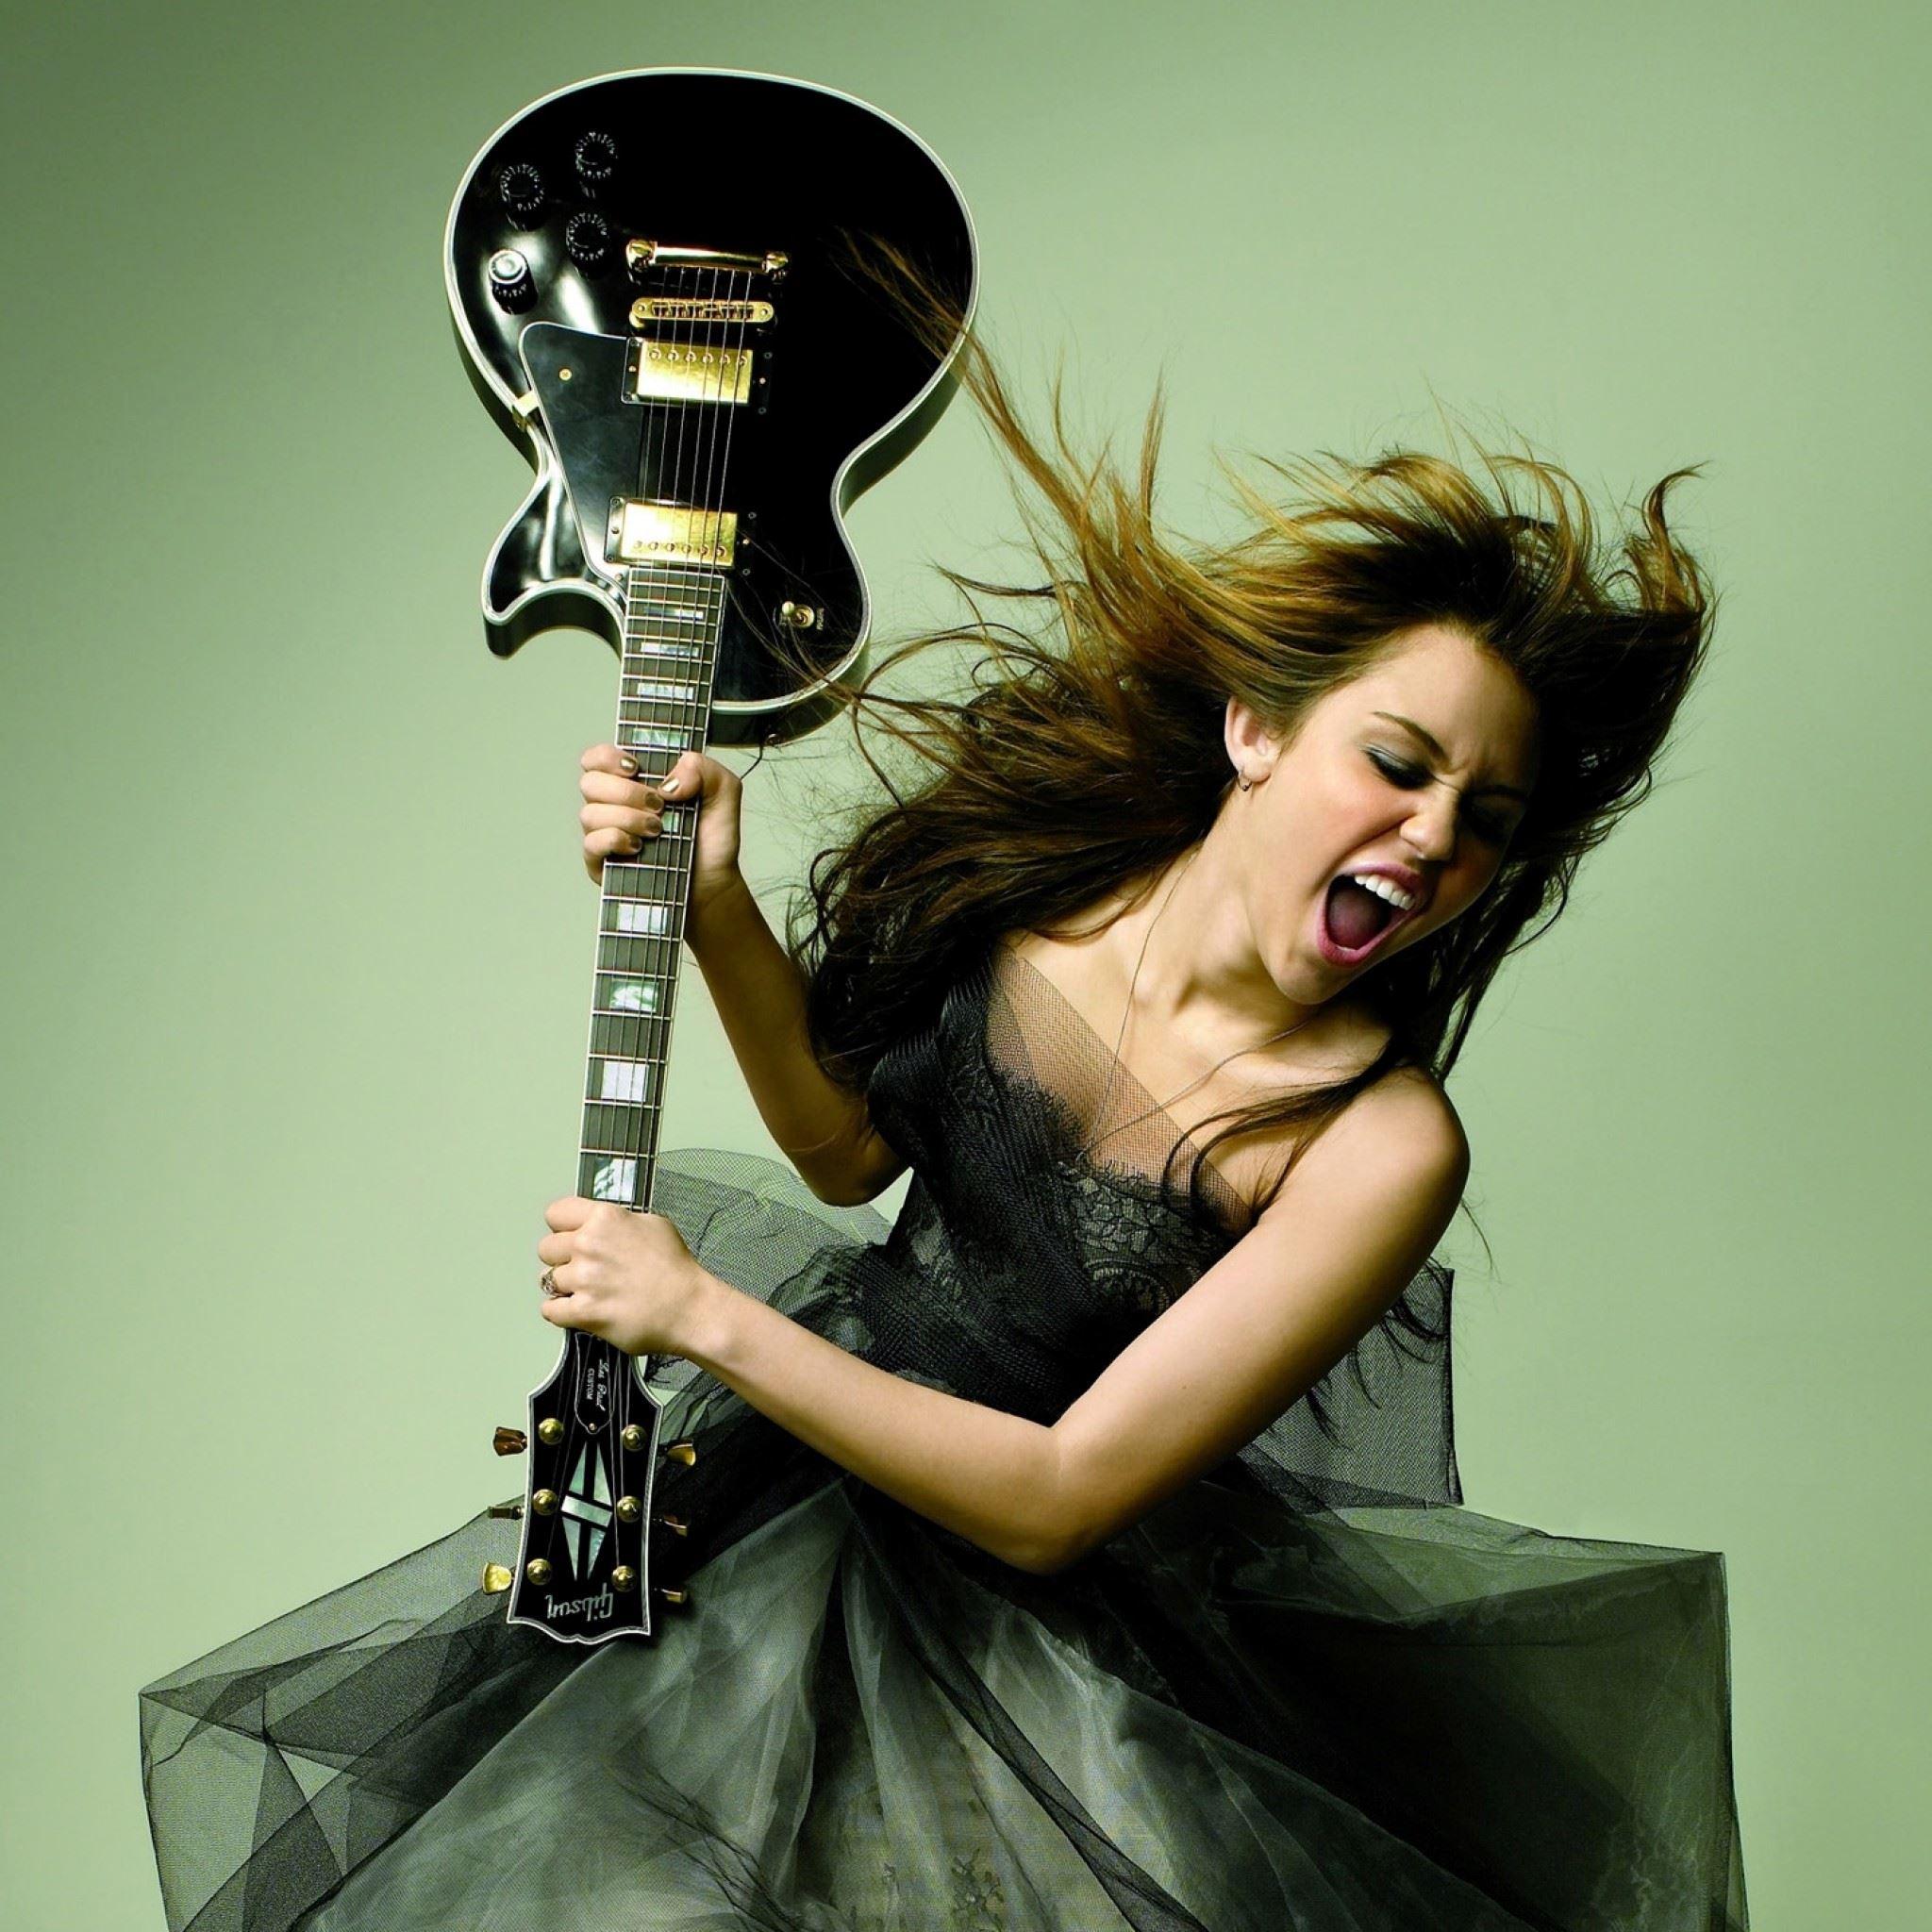 Miley Cyrus Glamour Magazine Photoshoot IPad Air